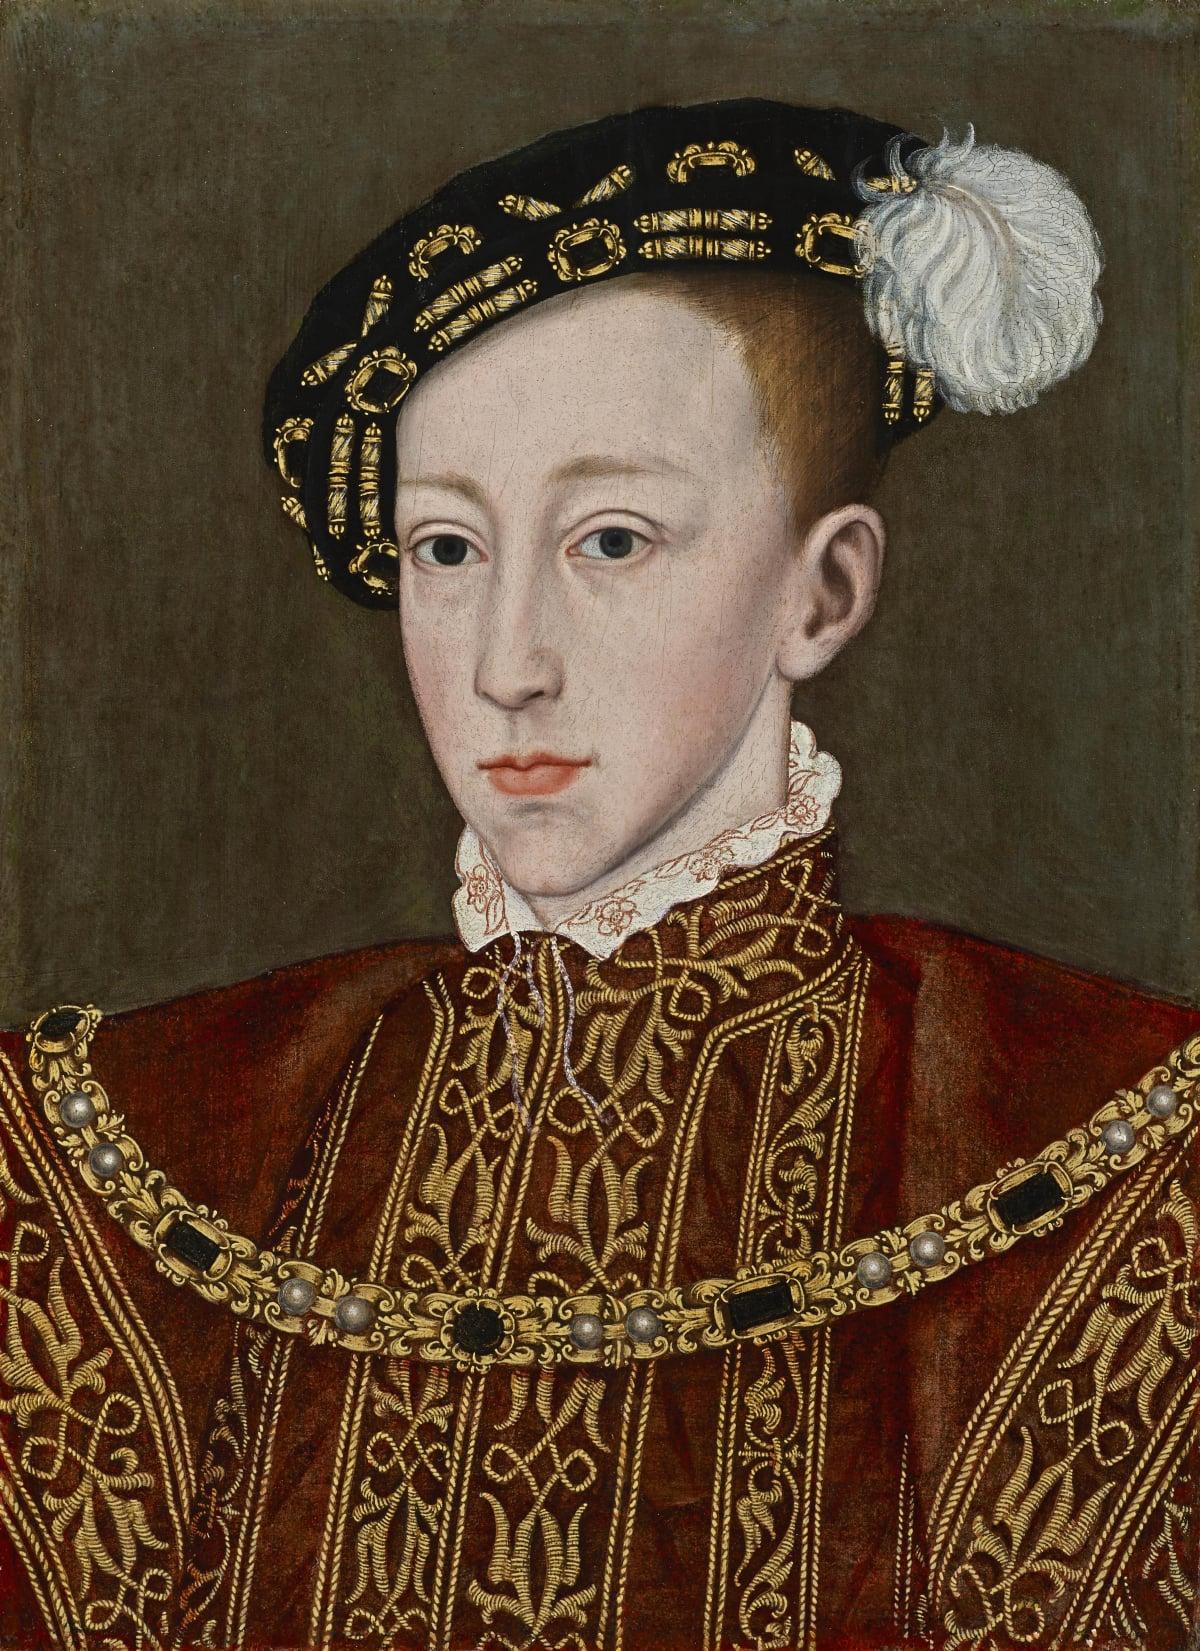 Studio of William Scrots (c. 1537 – 1553) Edward VI of England (1531 – 1553), circa 1550 Oil on panel 17 ¾ x 12 ¾ in. (44.9x 32.4 cm.)